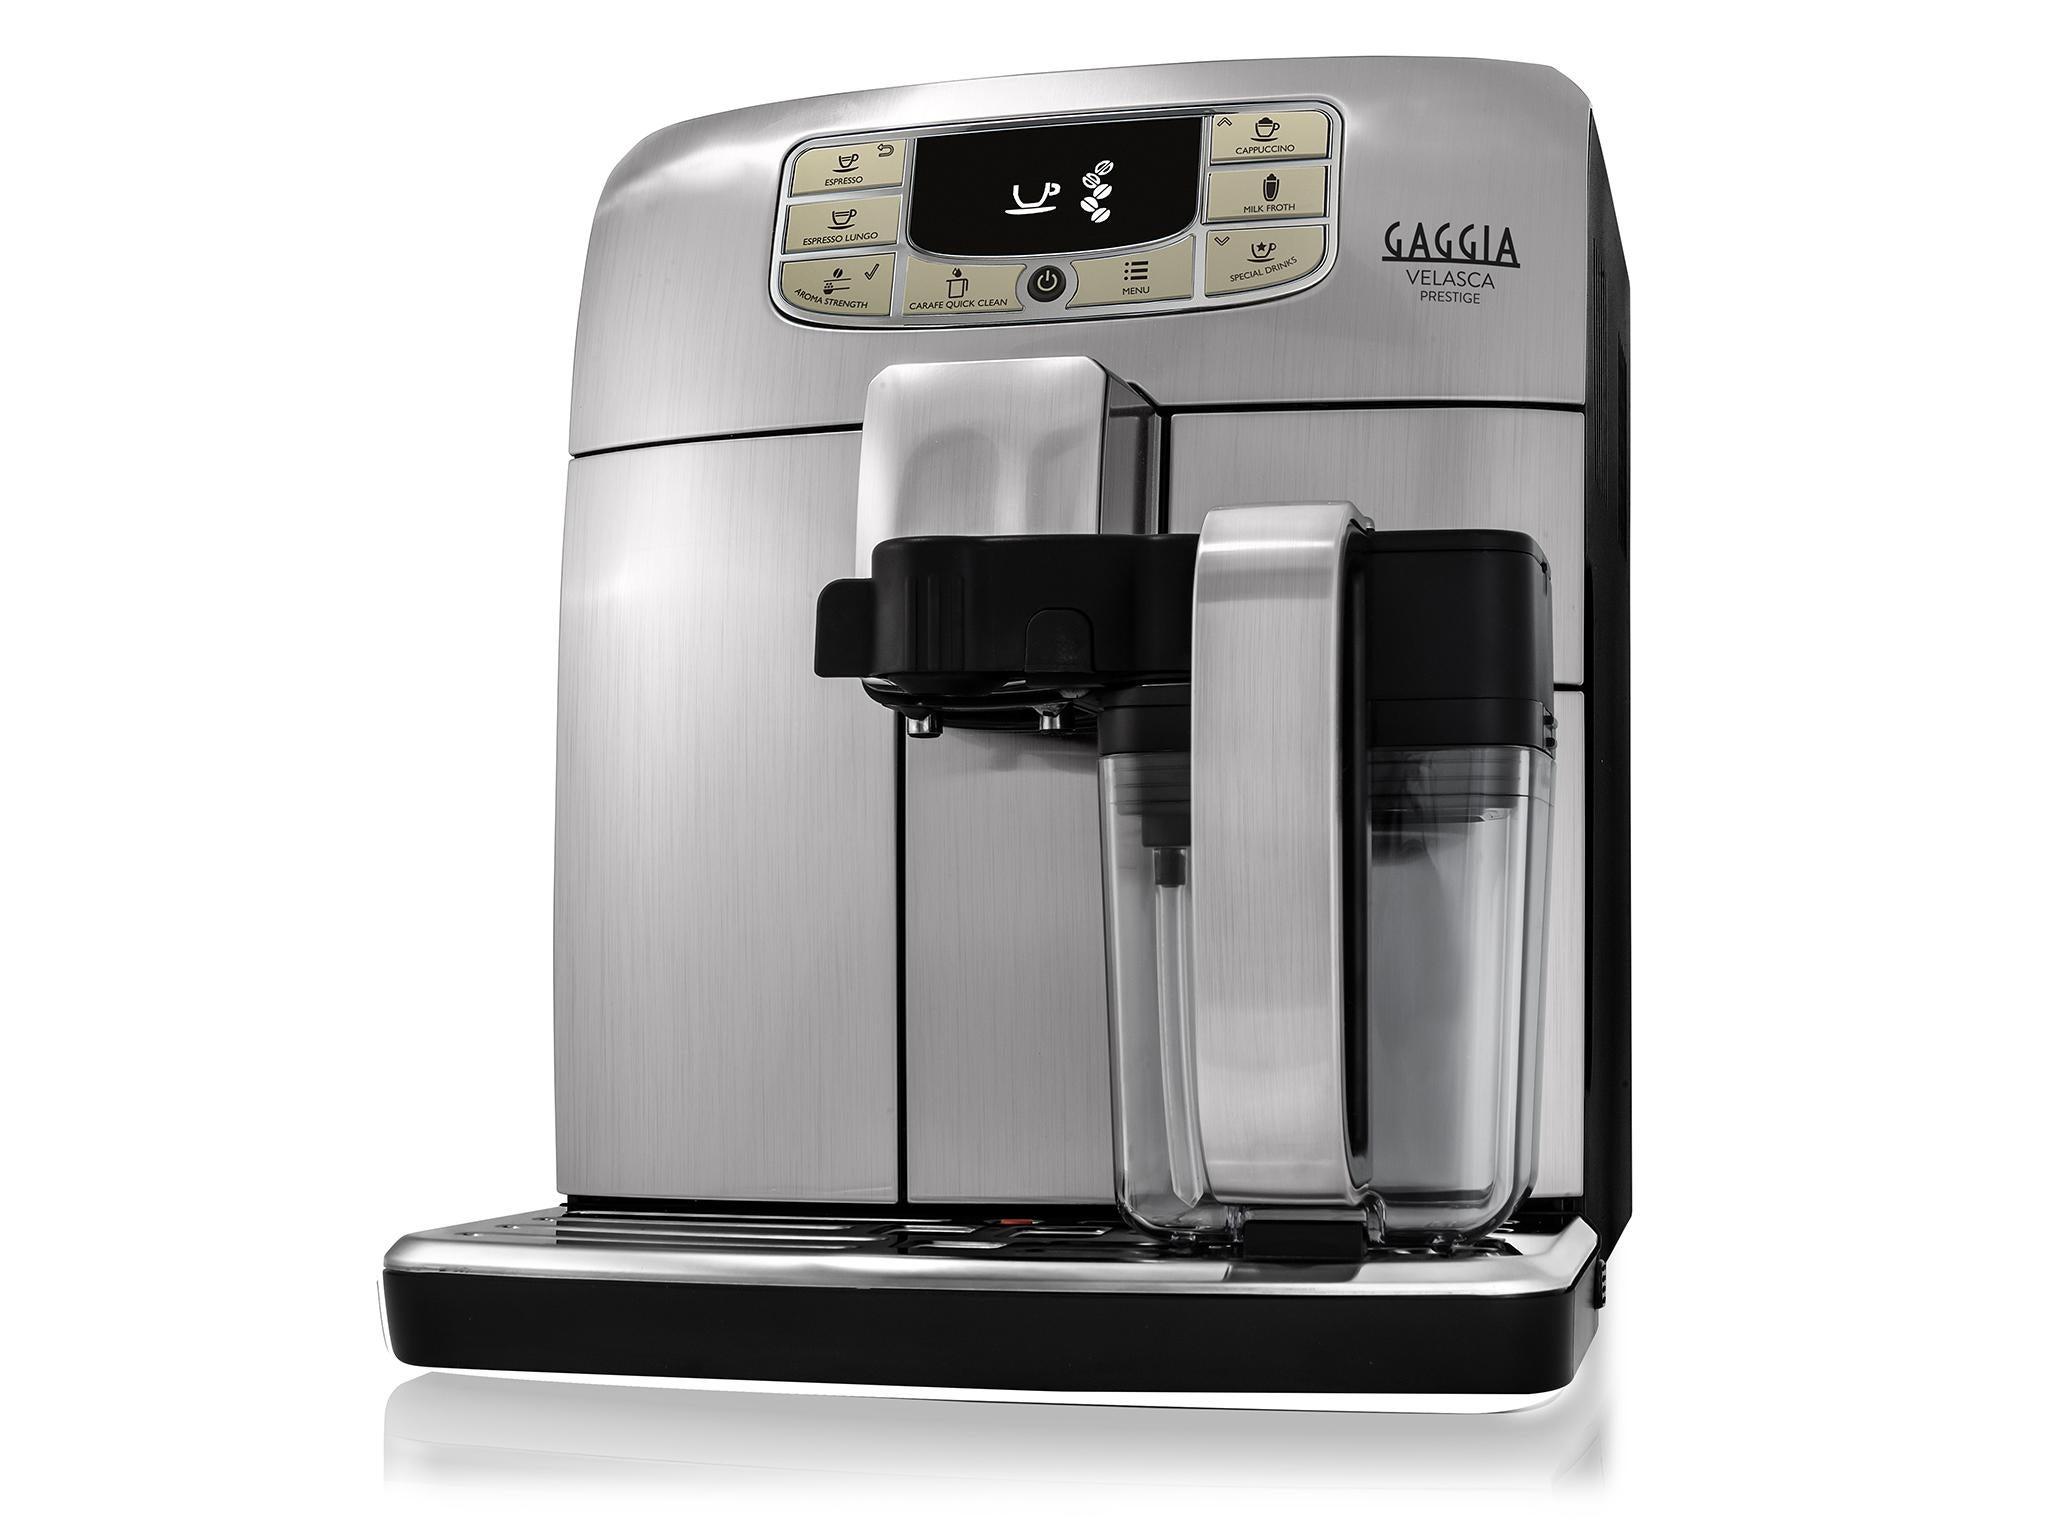 11 best espresso machines the independent say fandeluxe Images